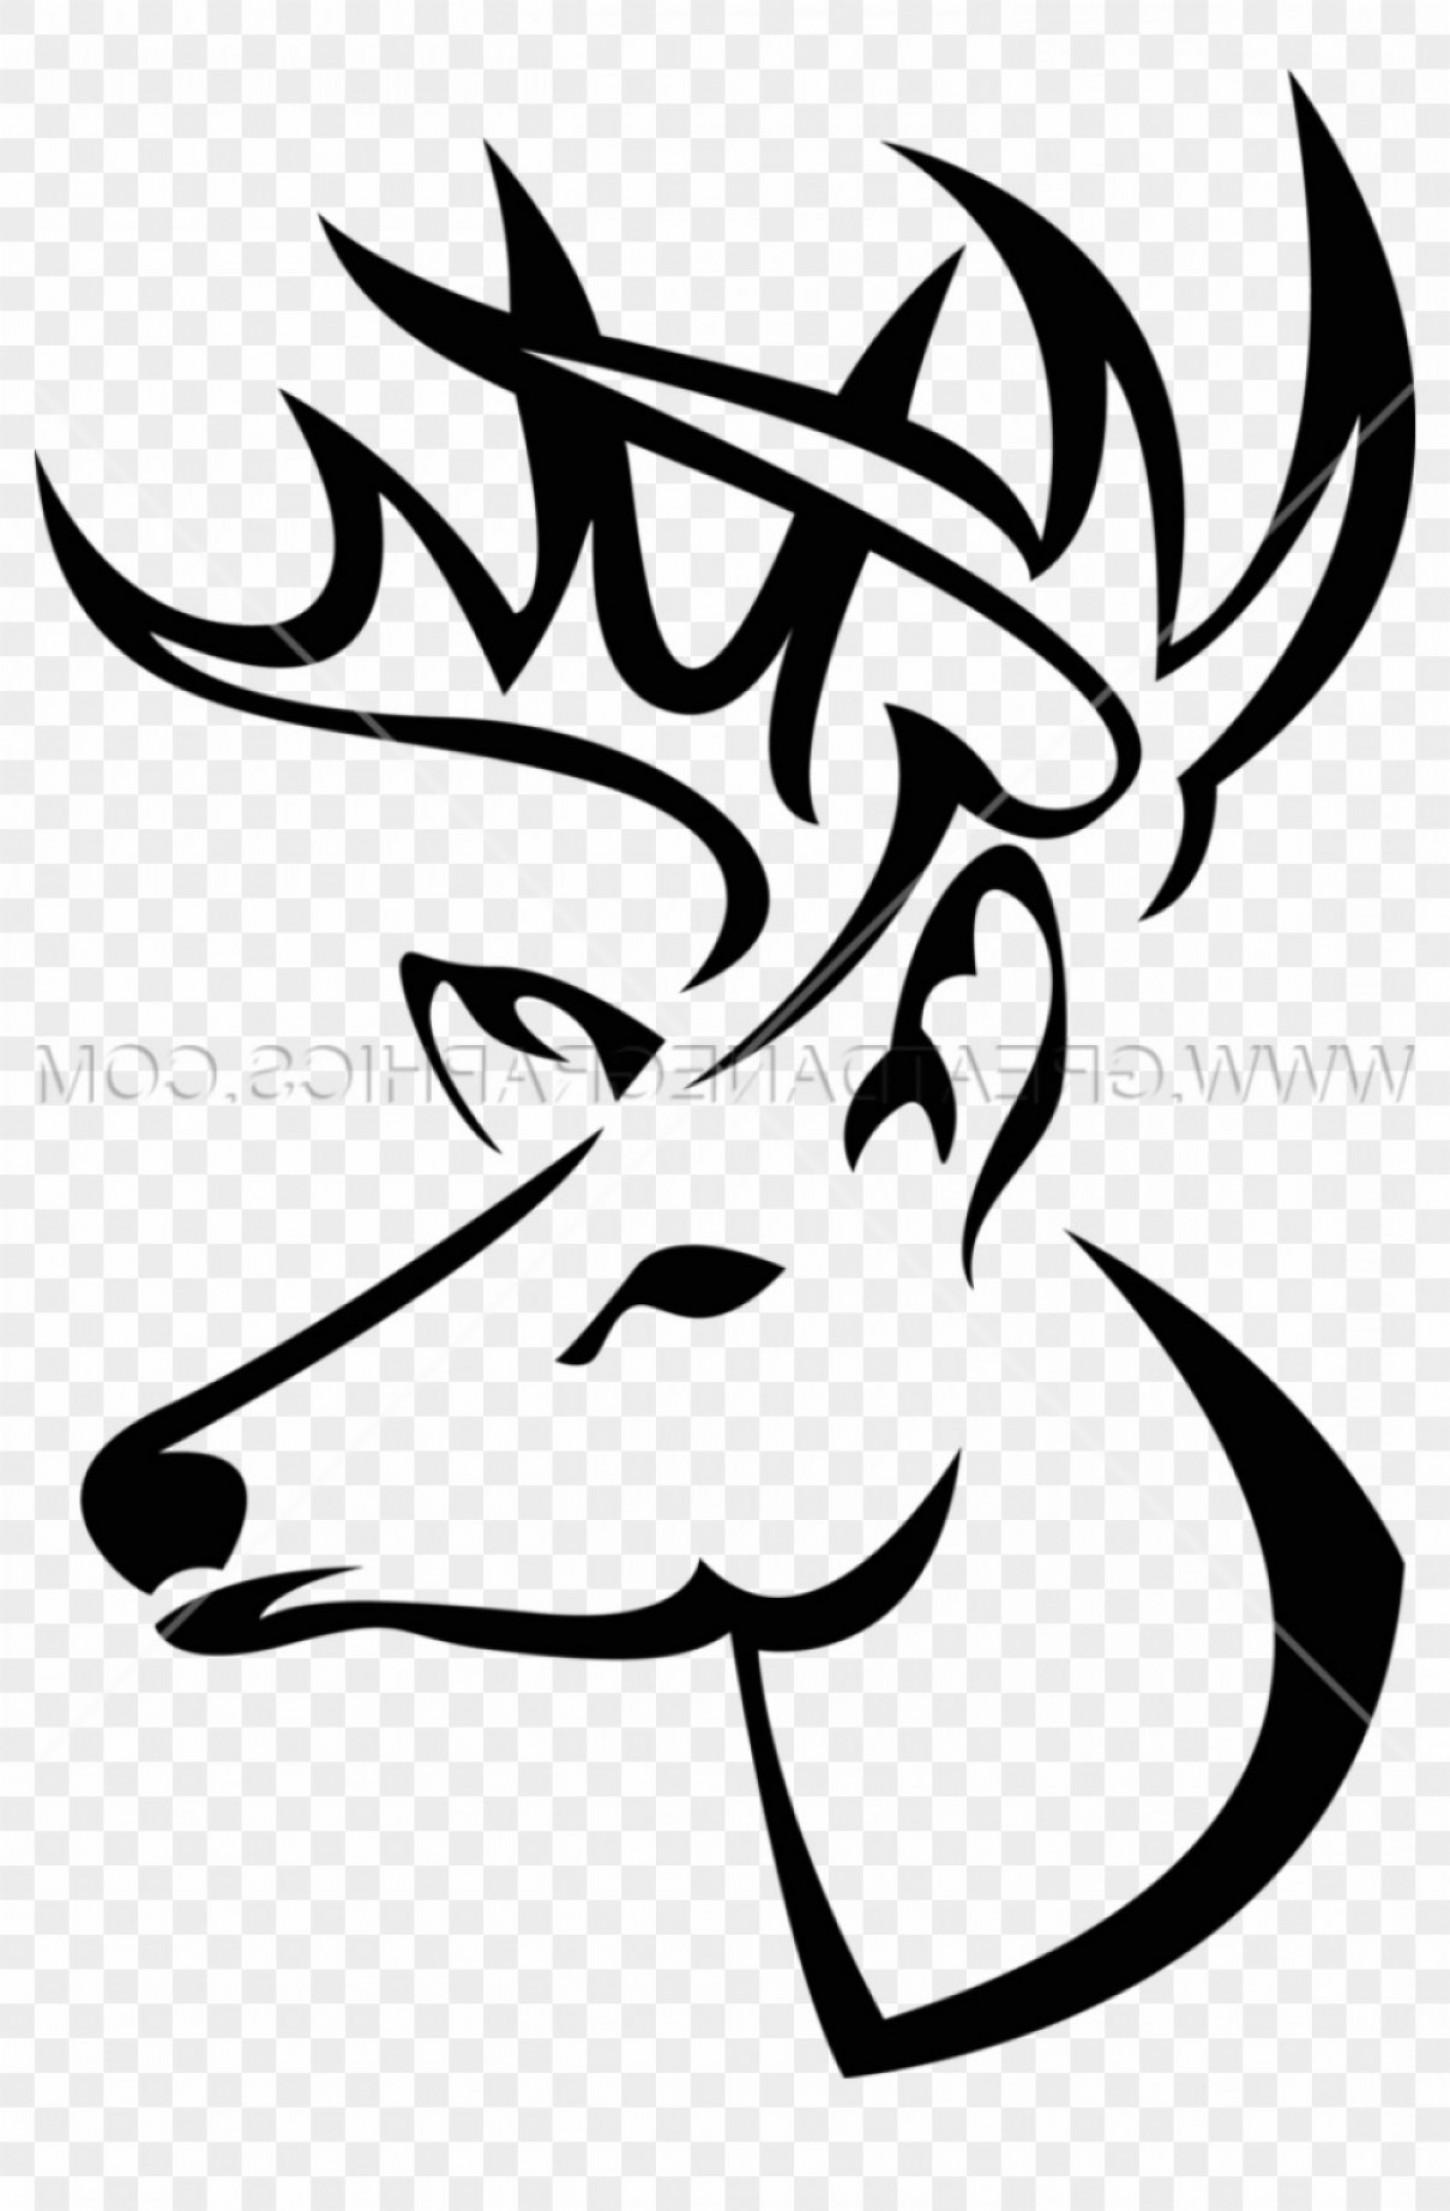 png library stock Miadbmbadeer art download buck. Drumsticks vector skull